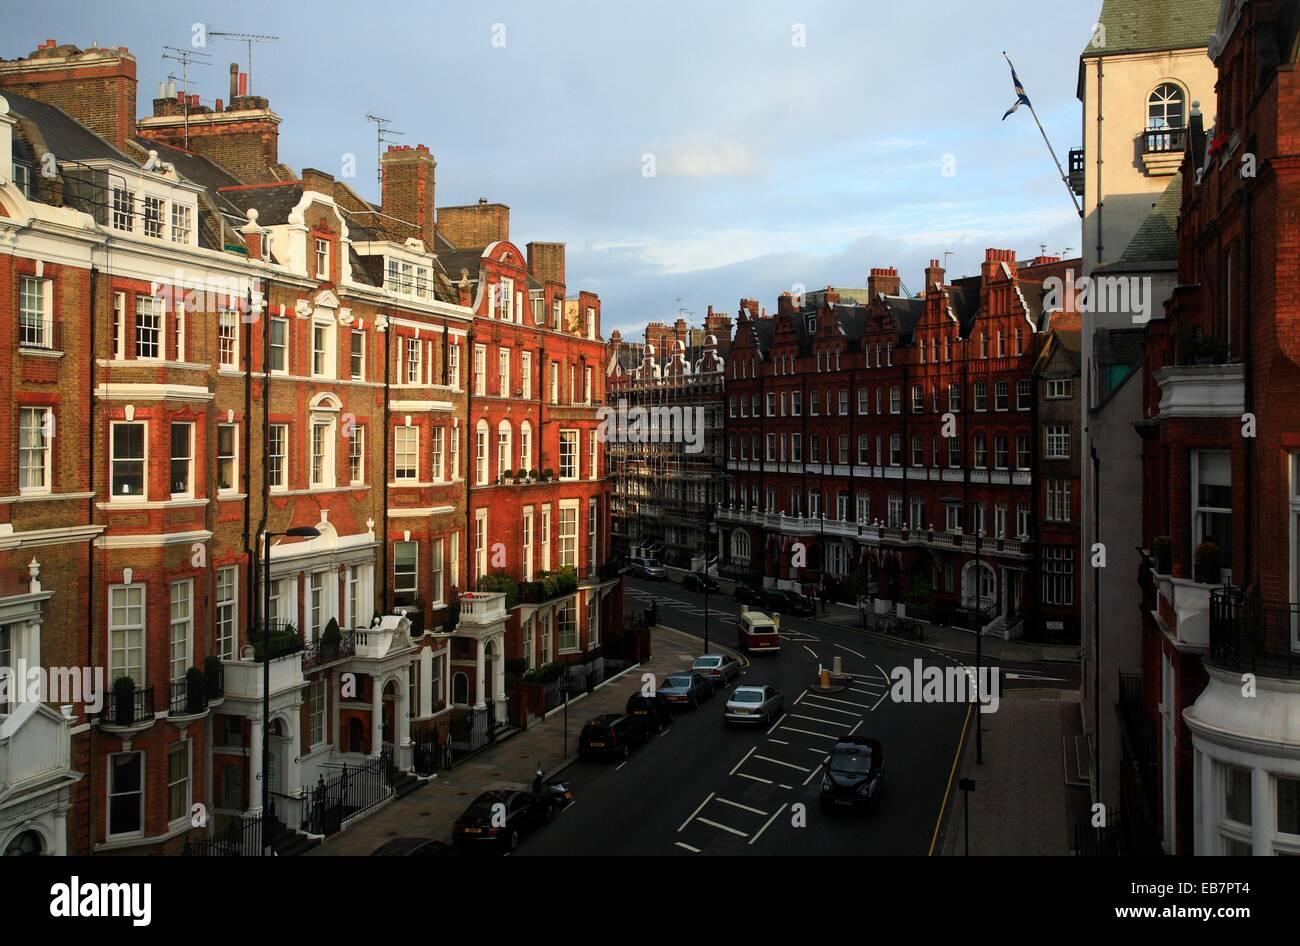 London Apartment Buildings Stock Photos & London Apartment Buildings ...